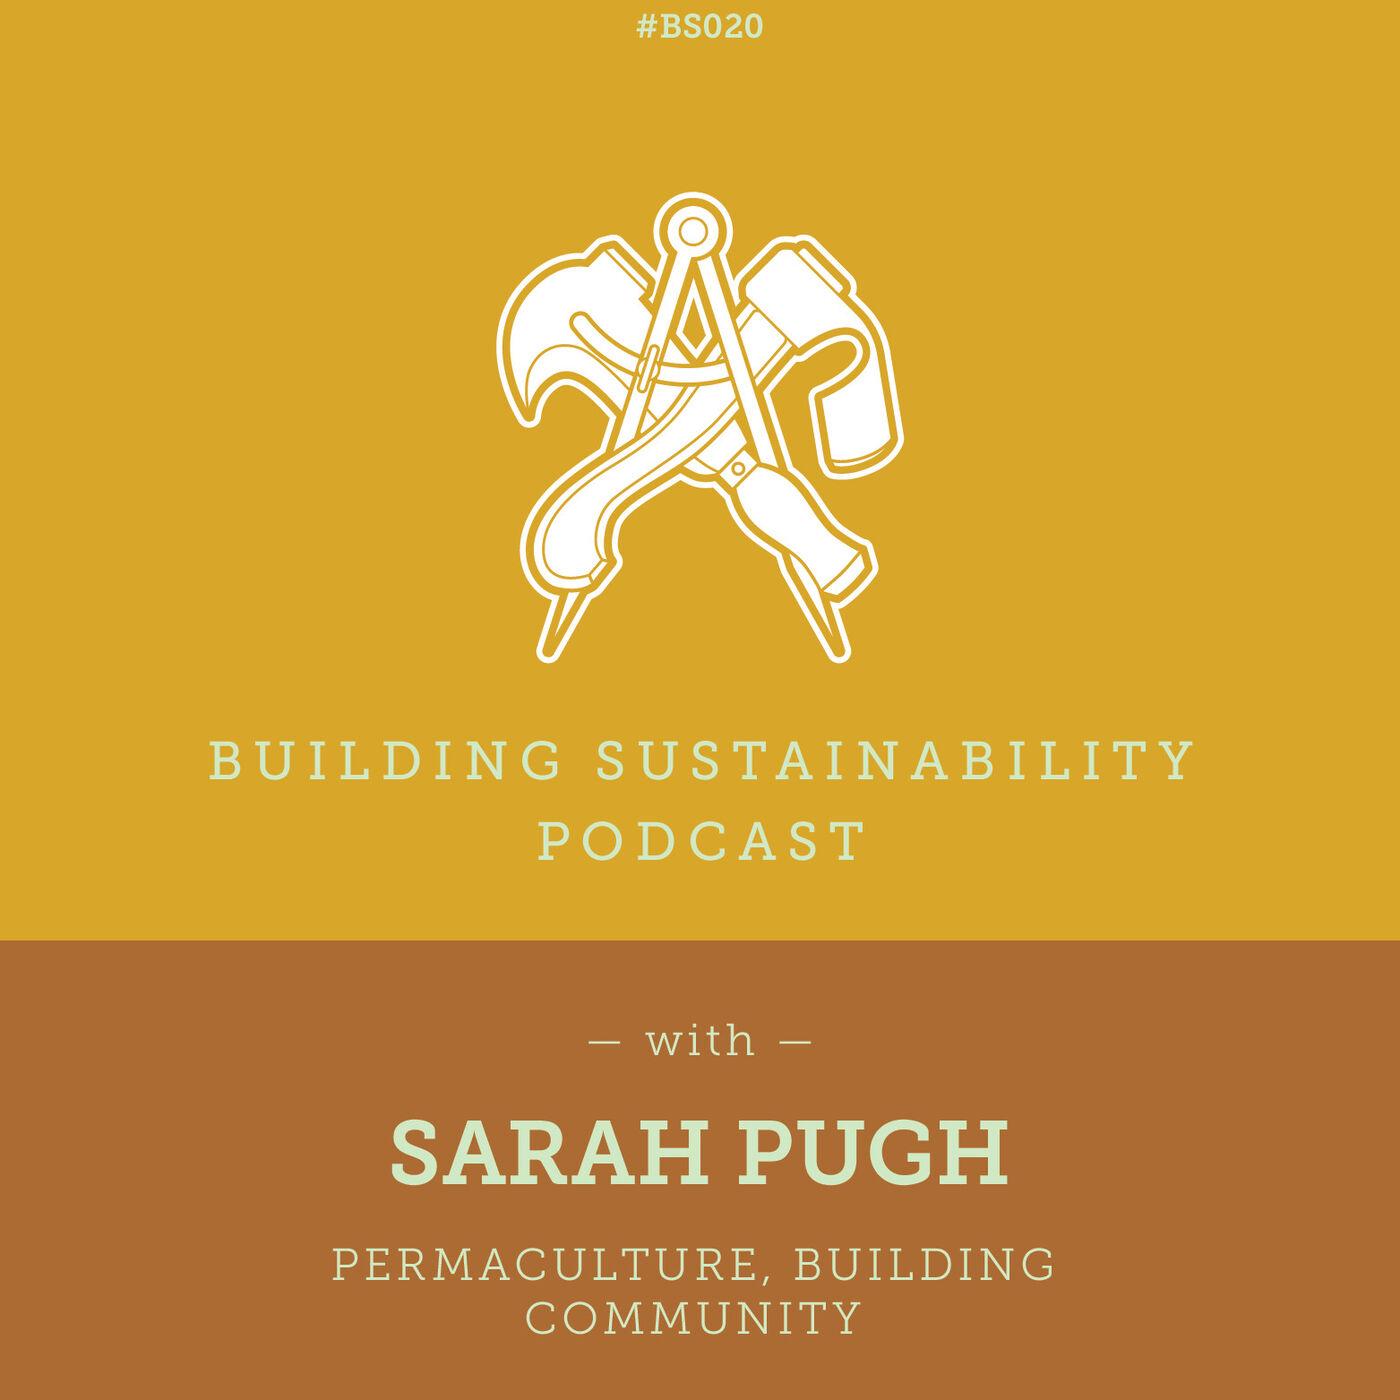 Permaculture, Building Community - Sarah Pugh - BS020